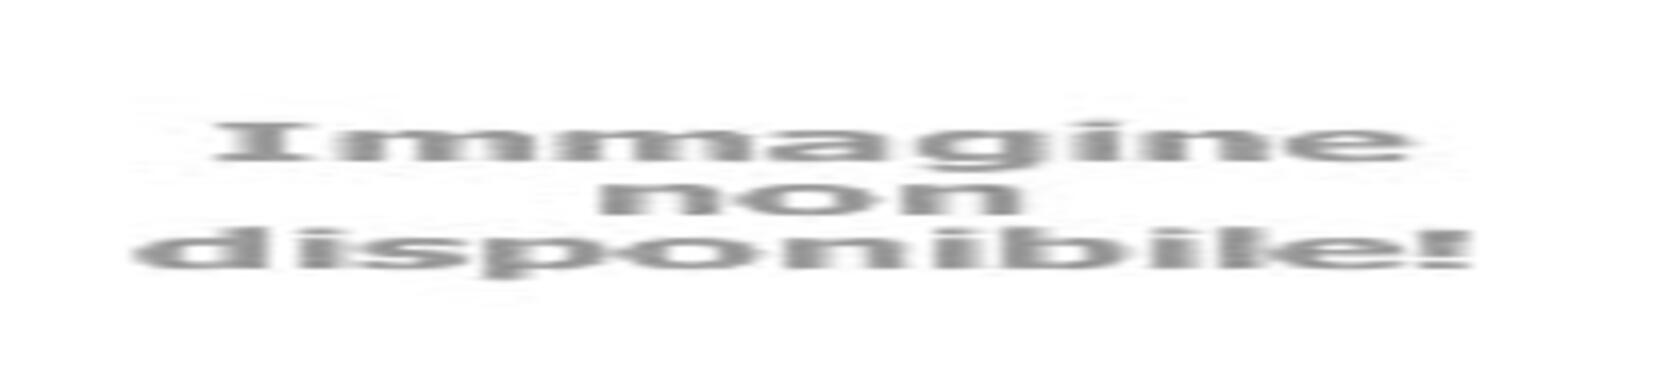 basketriminicrabs it 2-2755-settore-giovanile-u14-elite-renzo-galli 003